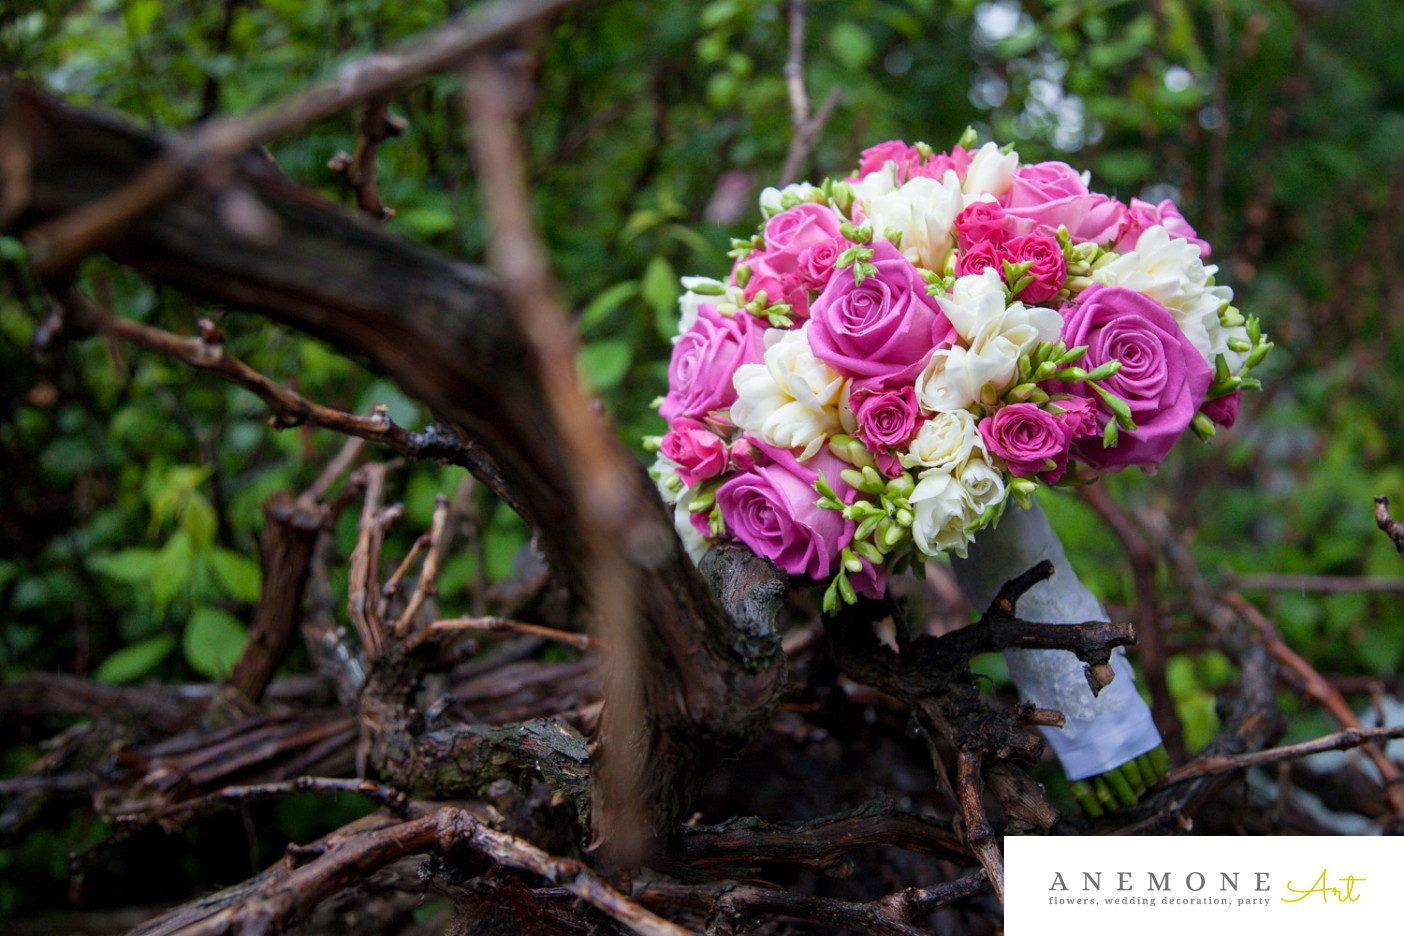 Poza, foto cu Flori de nunta buchet mireasa, rotund, roz, ticlam, trandafiri in Arad, Timisoara, Oradea (wedding flowers, bouquets) nunta Arad, Timisoara, Oradea